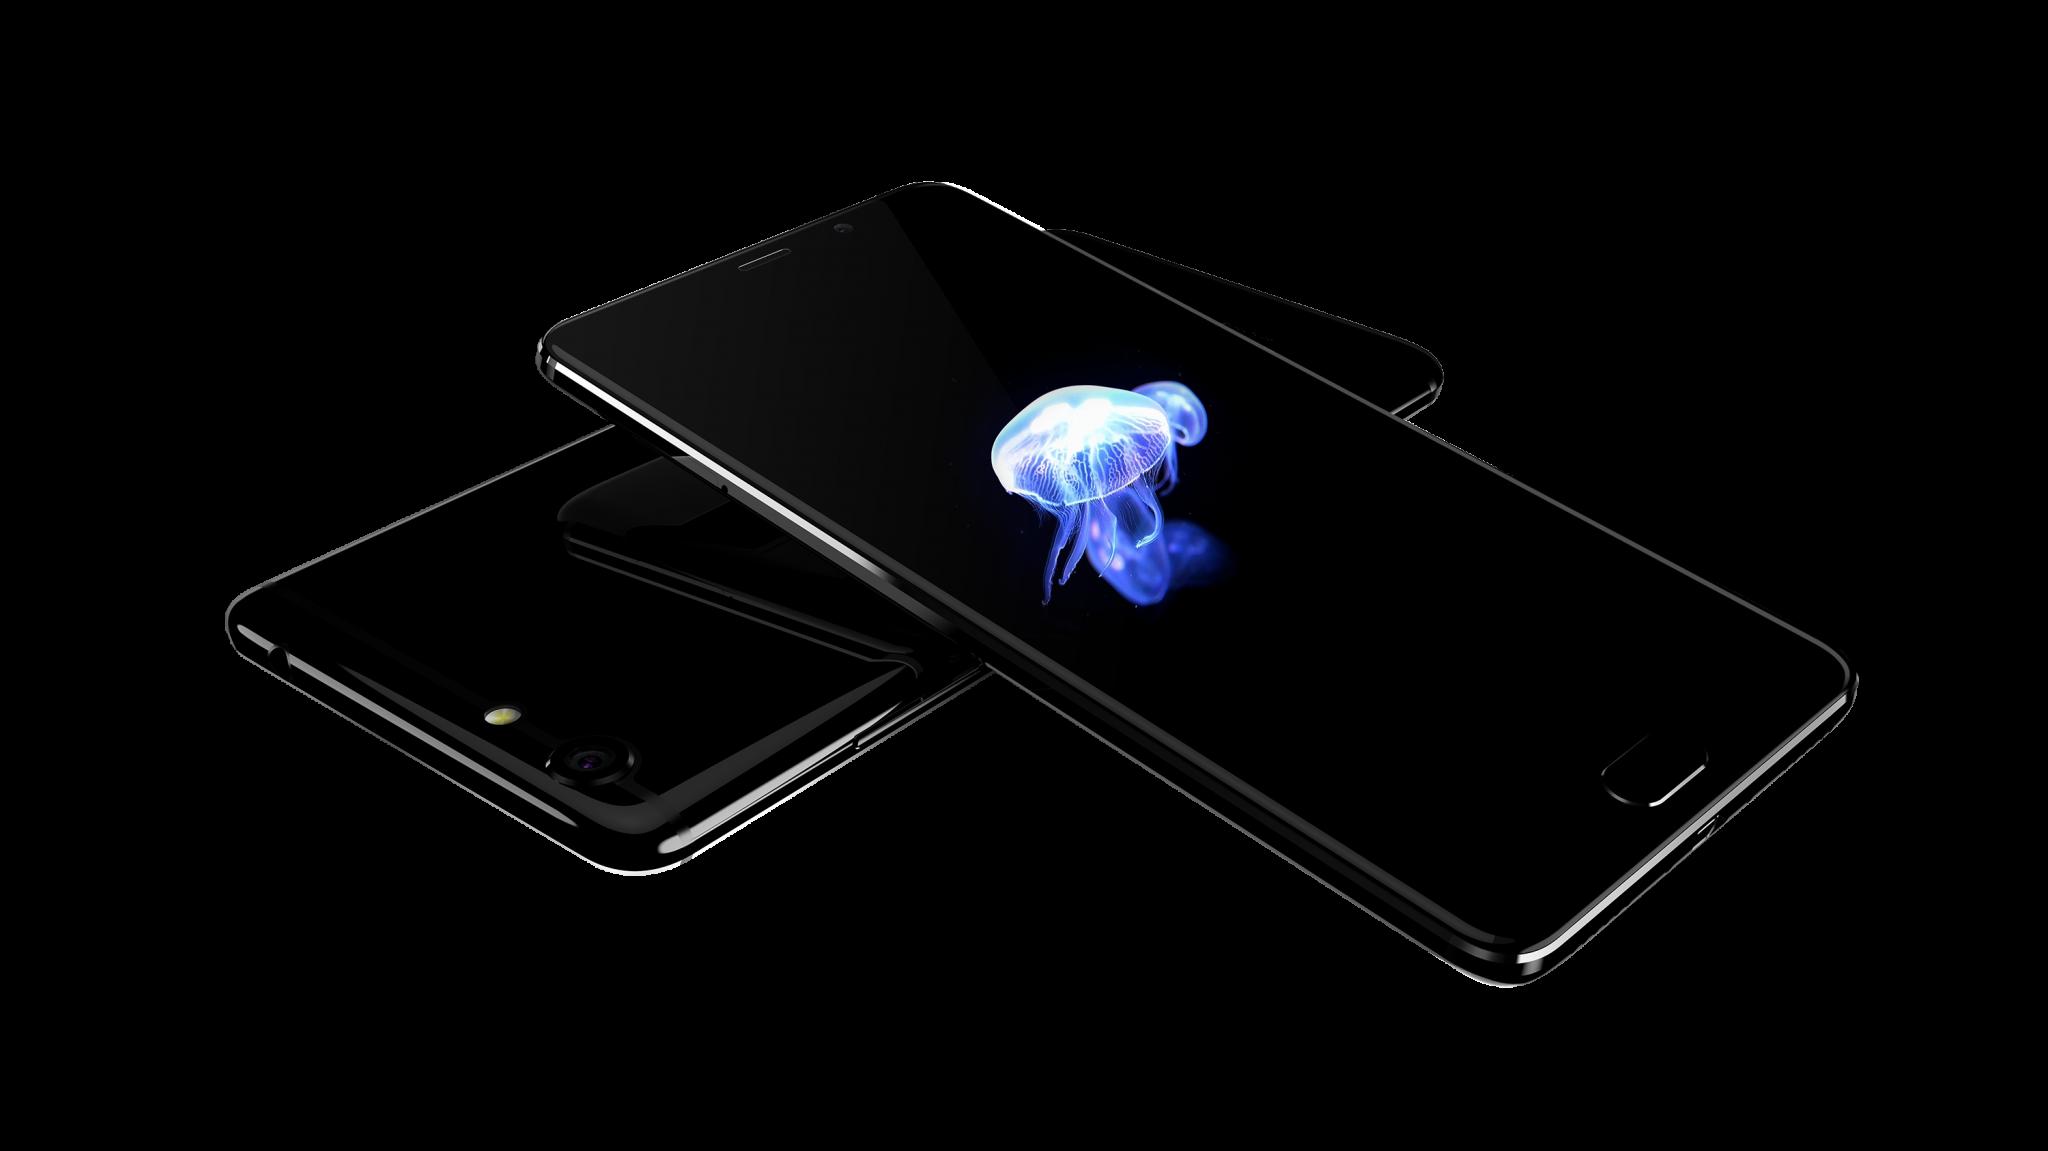 elephone-s7-r9-black-color-1